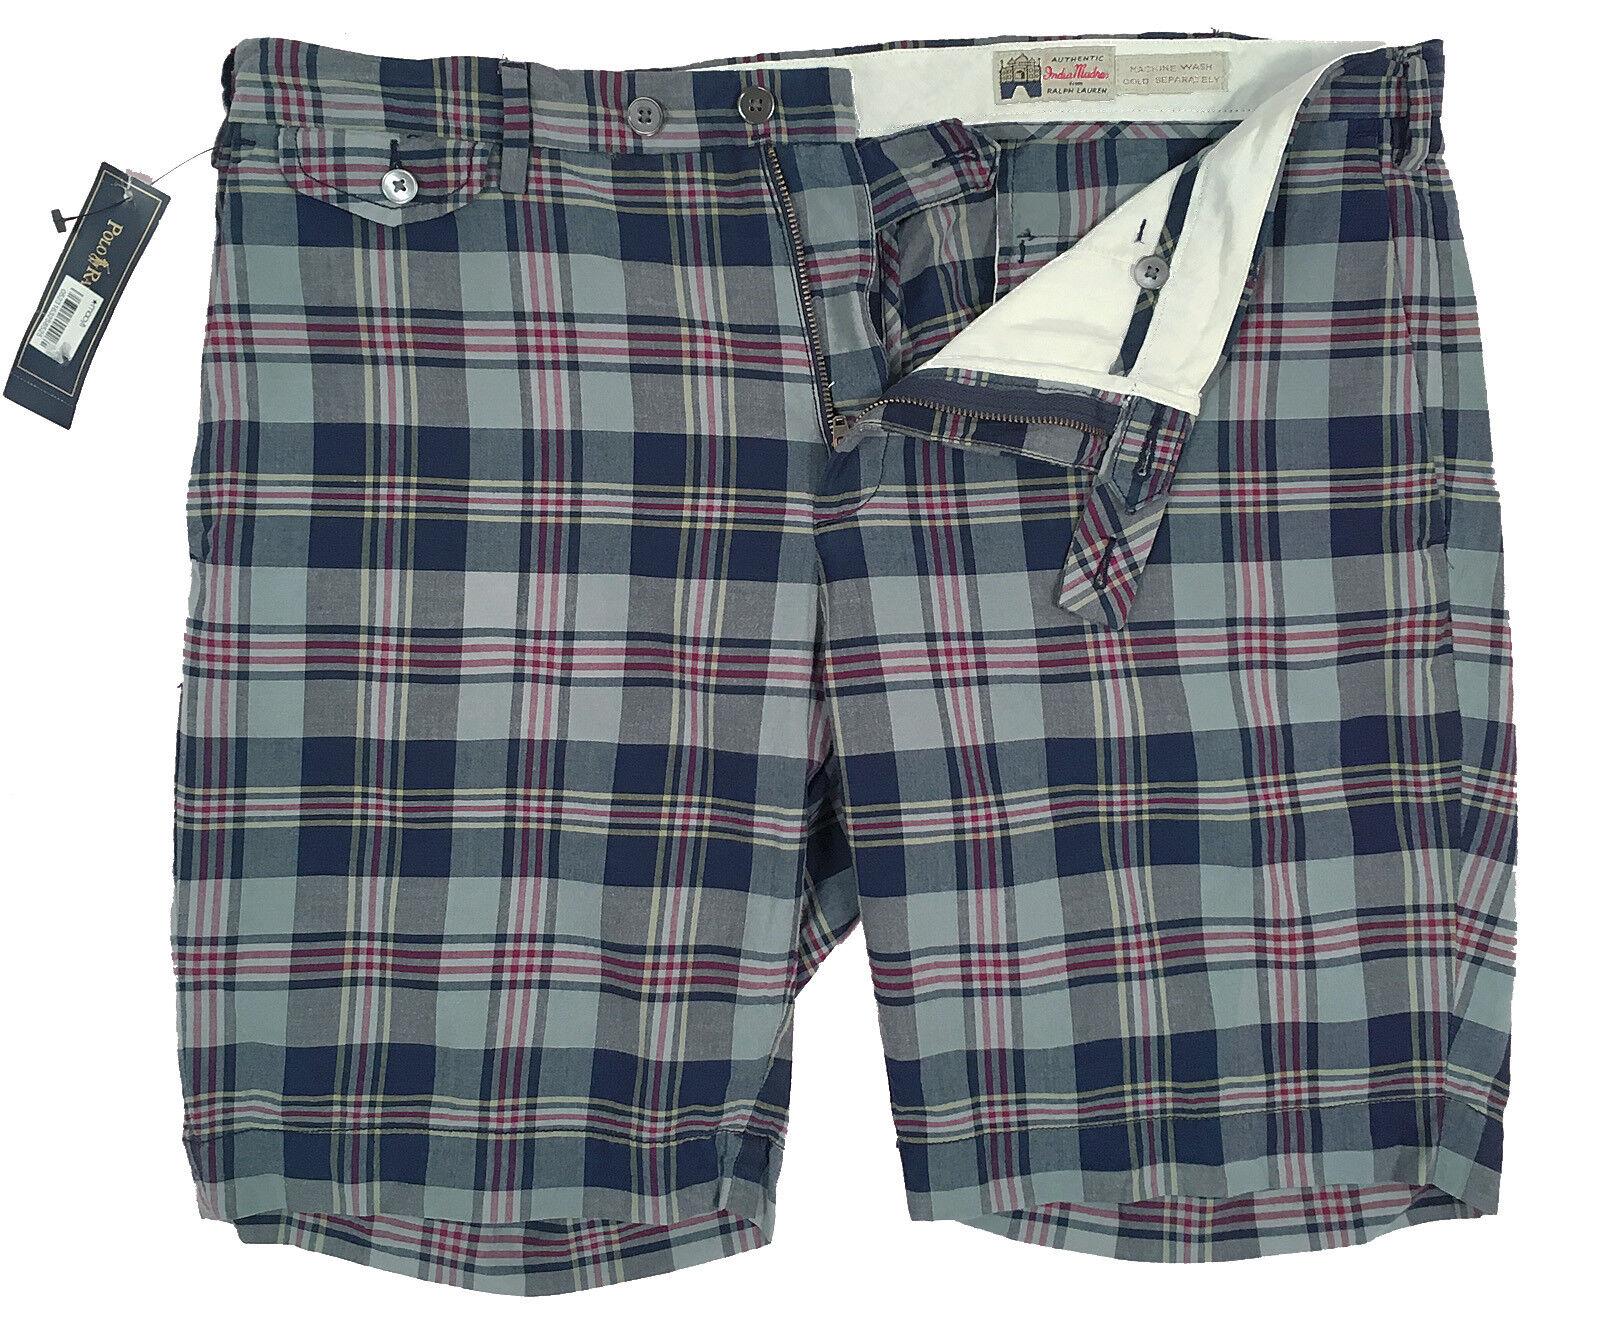 NEW  Polo Ralph Lauren Shorts   Madras Cotton   2 Plaid Patterns